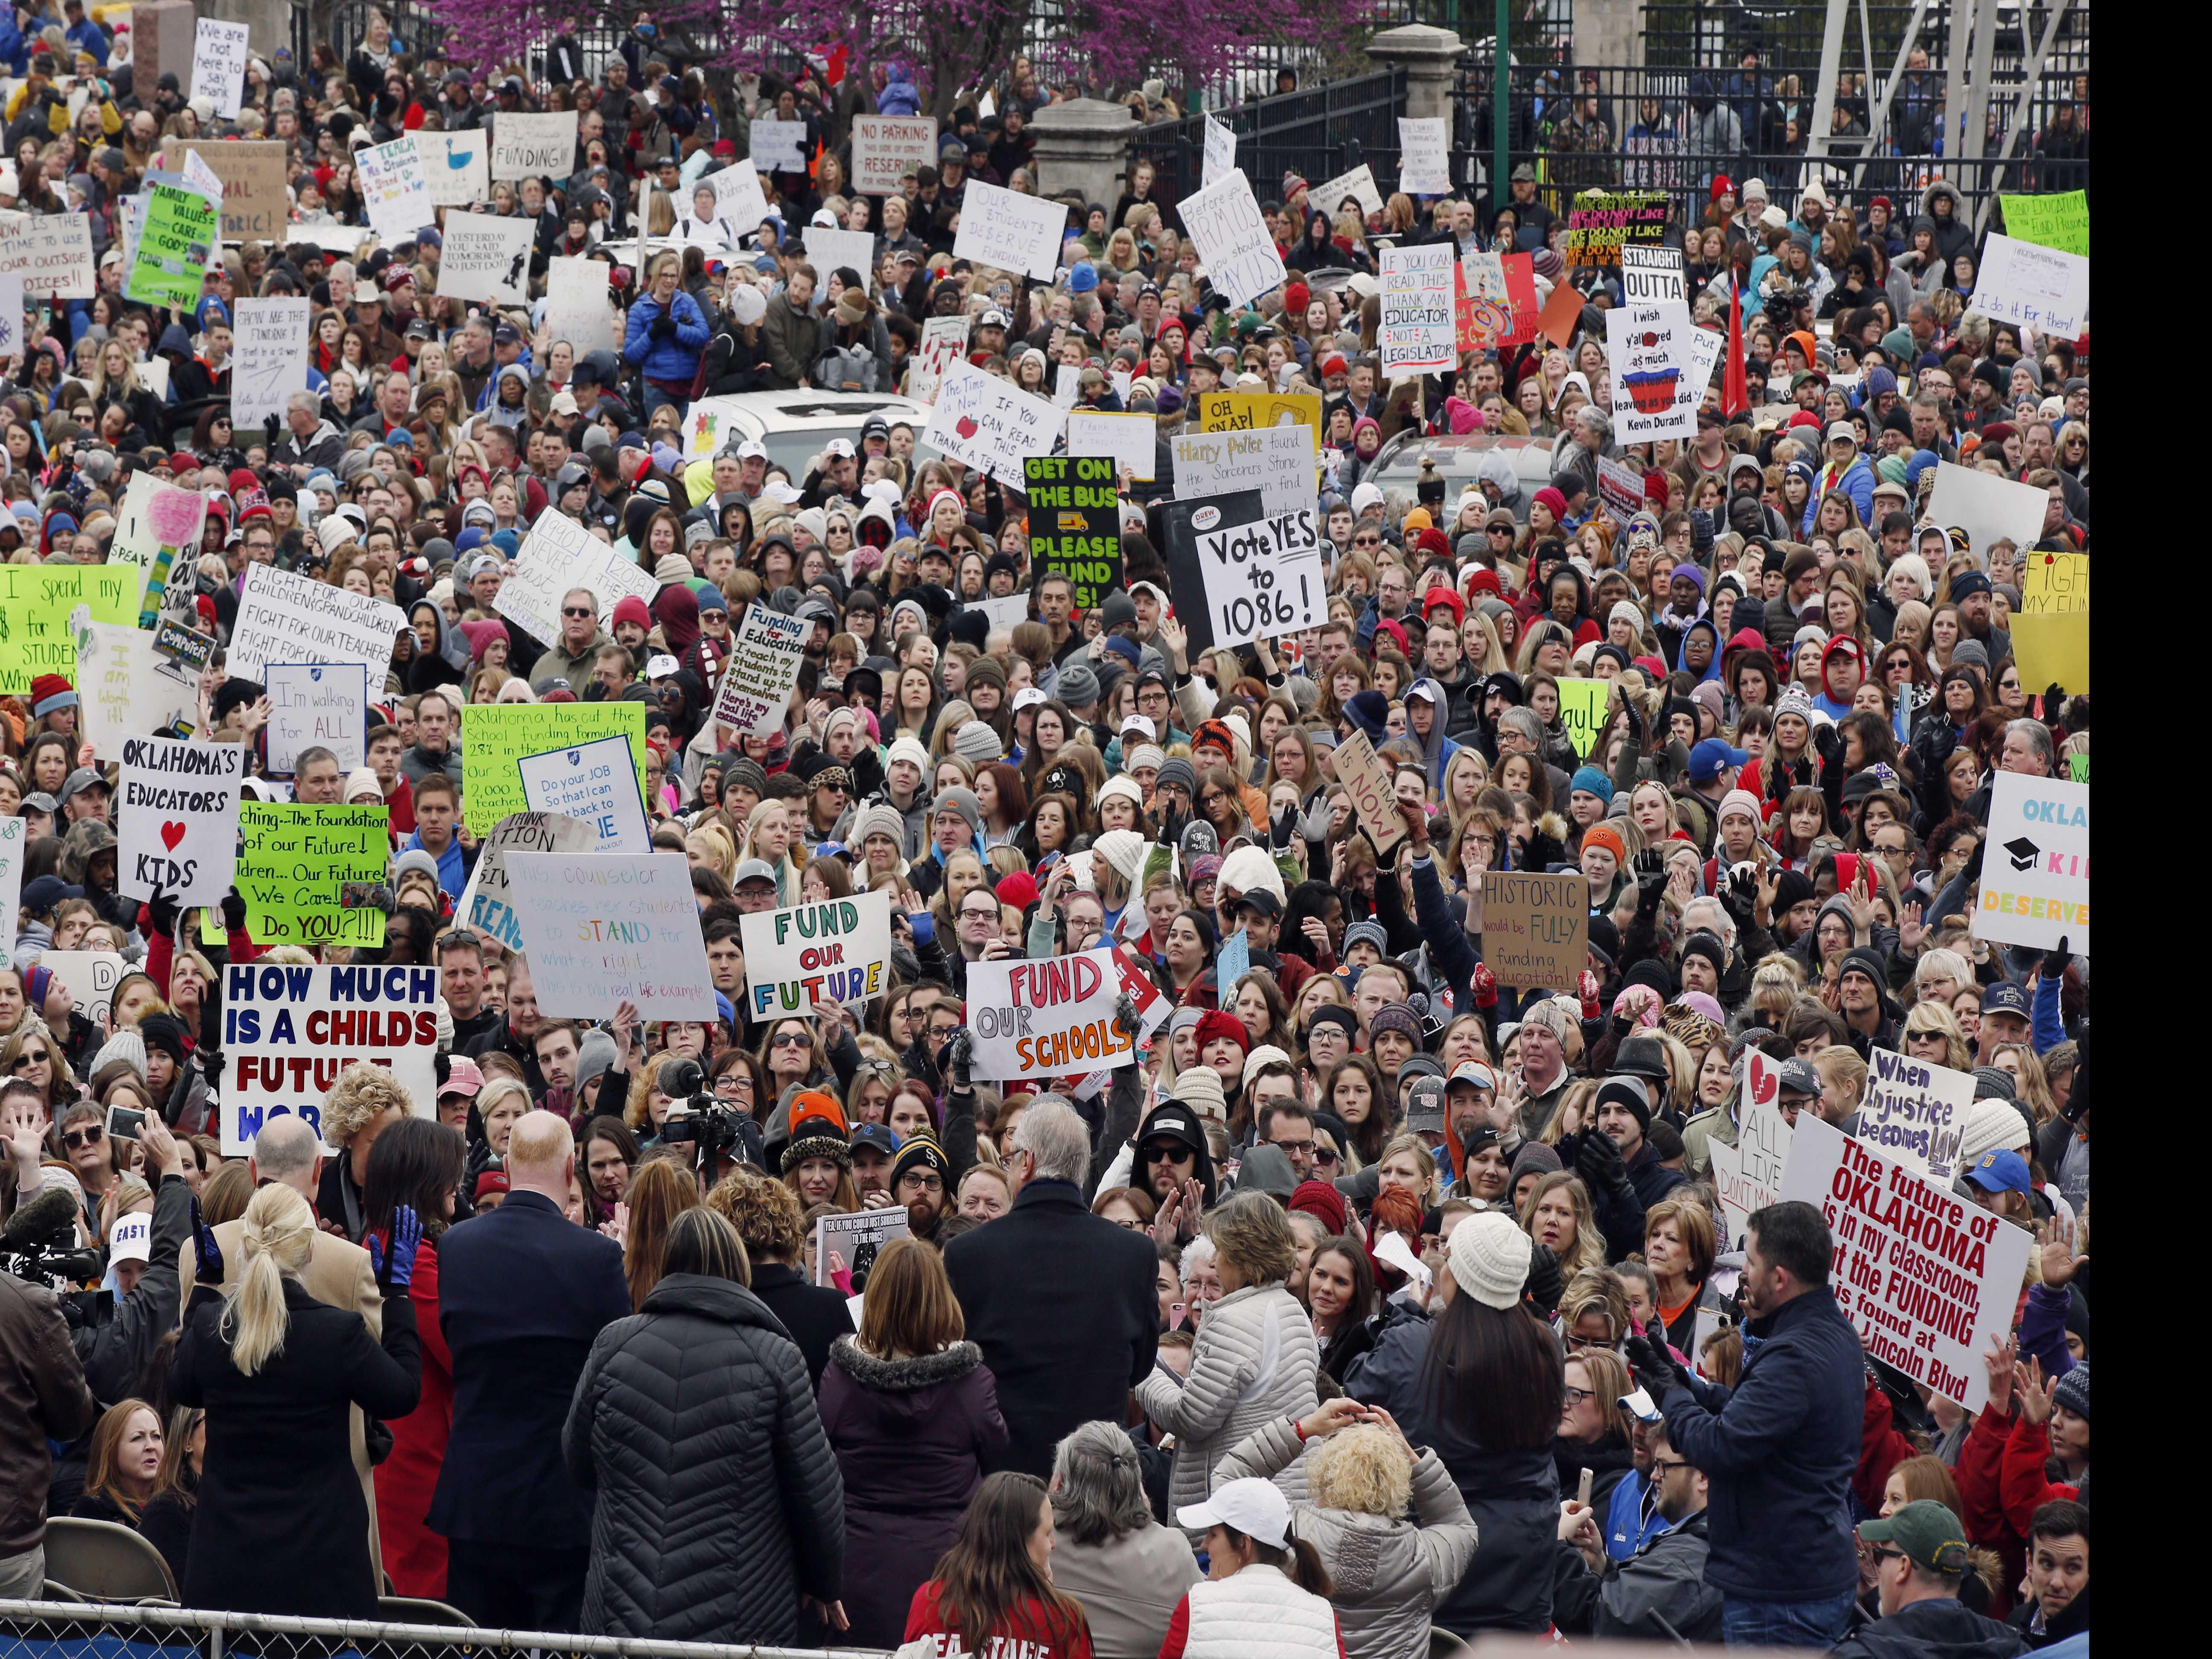 Resistance Makes Subtle Impact Even Where Trump is Popular